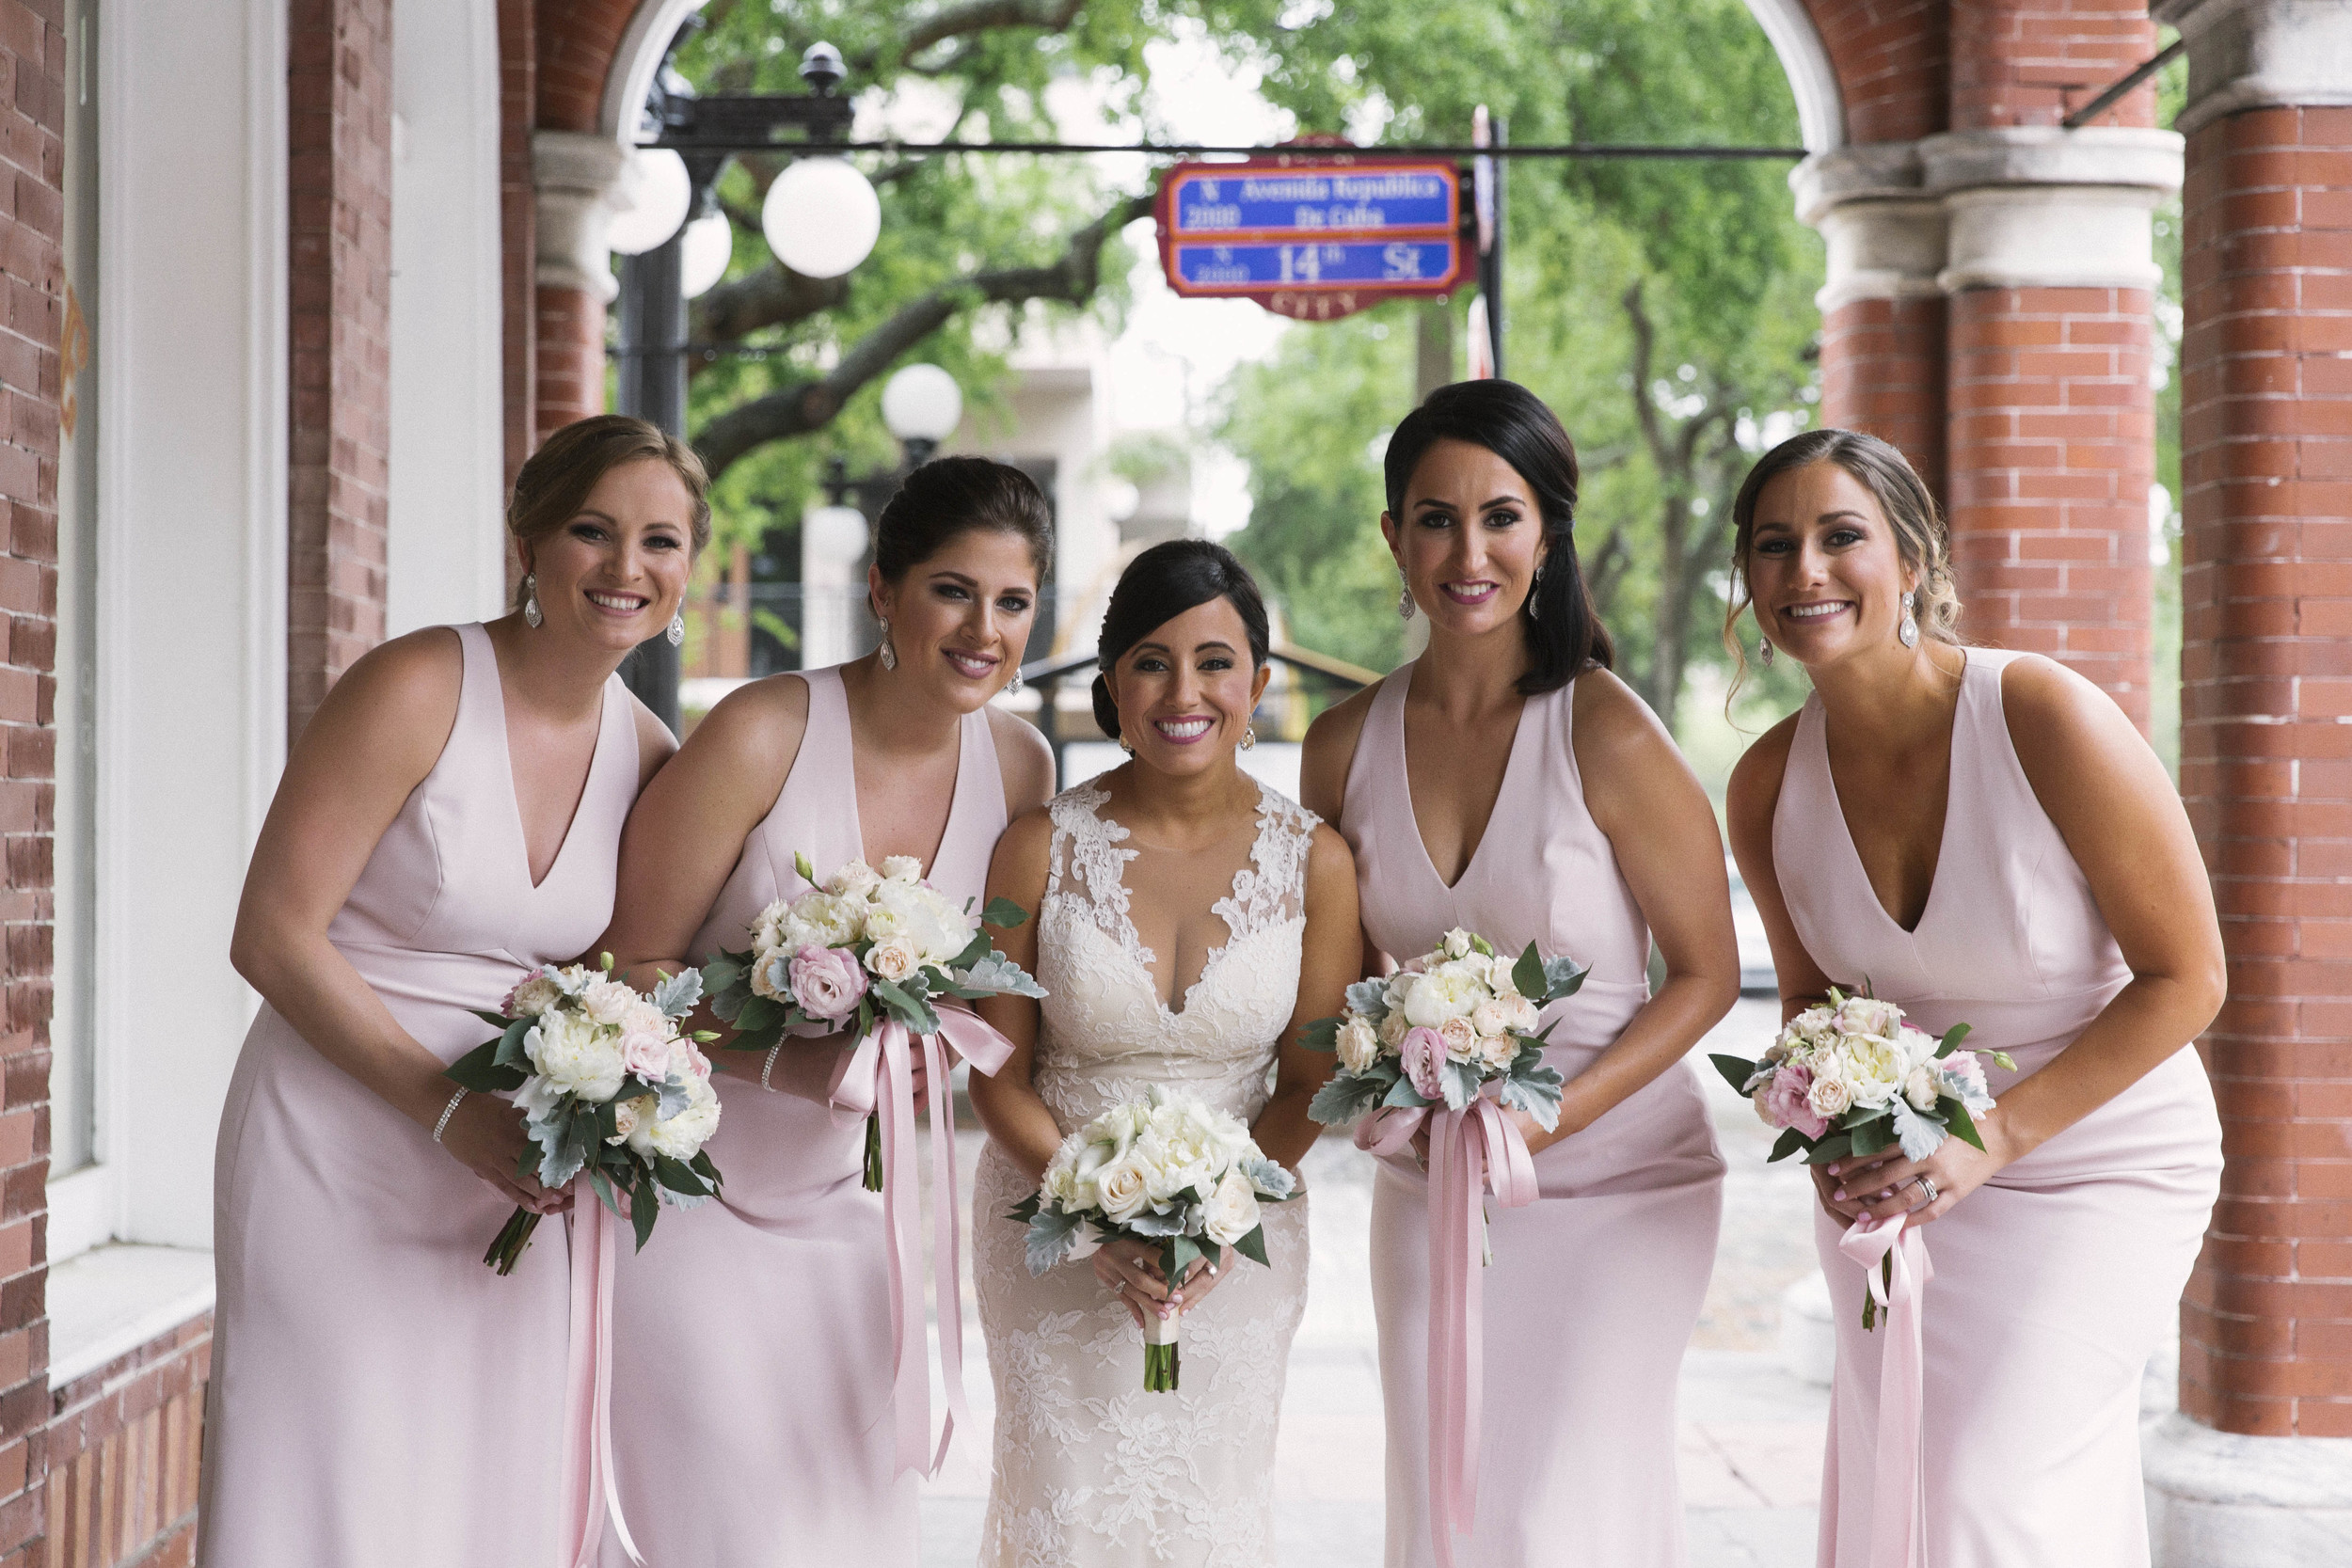 winsor event studio ybor tampa wedding blush bridesmaid dresses